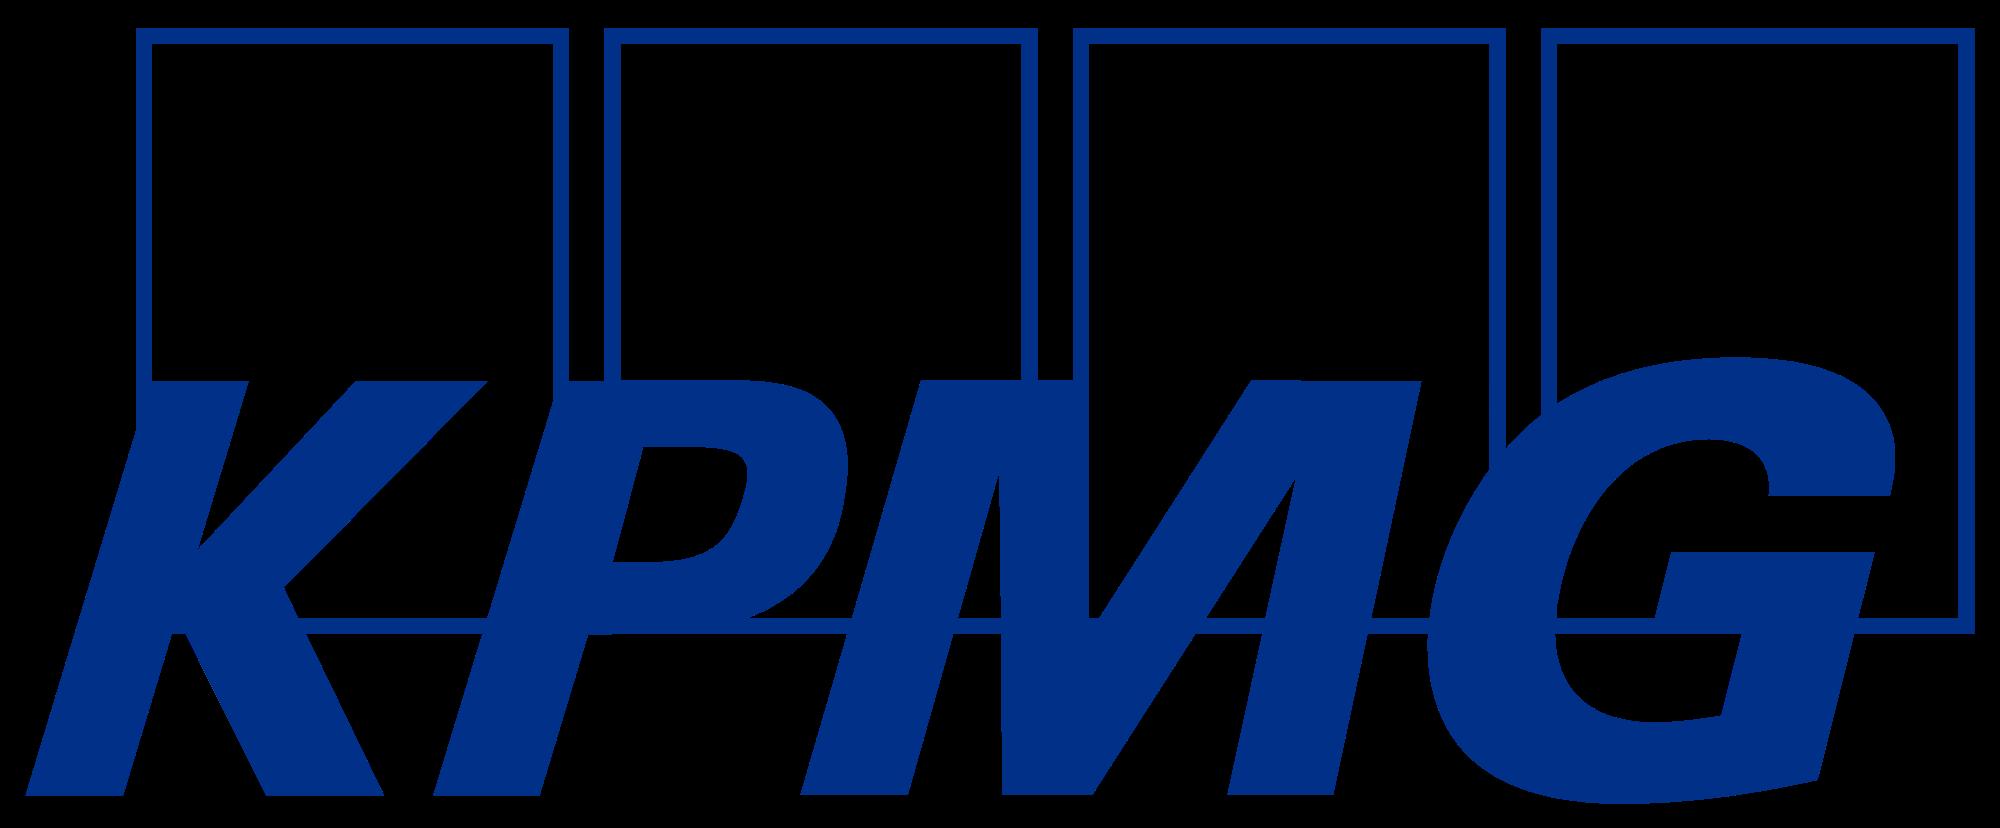 KPMG Smart Start & Pitch Doktor Florian Kandler